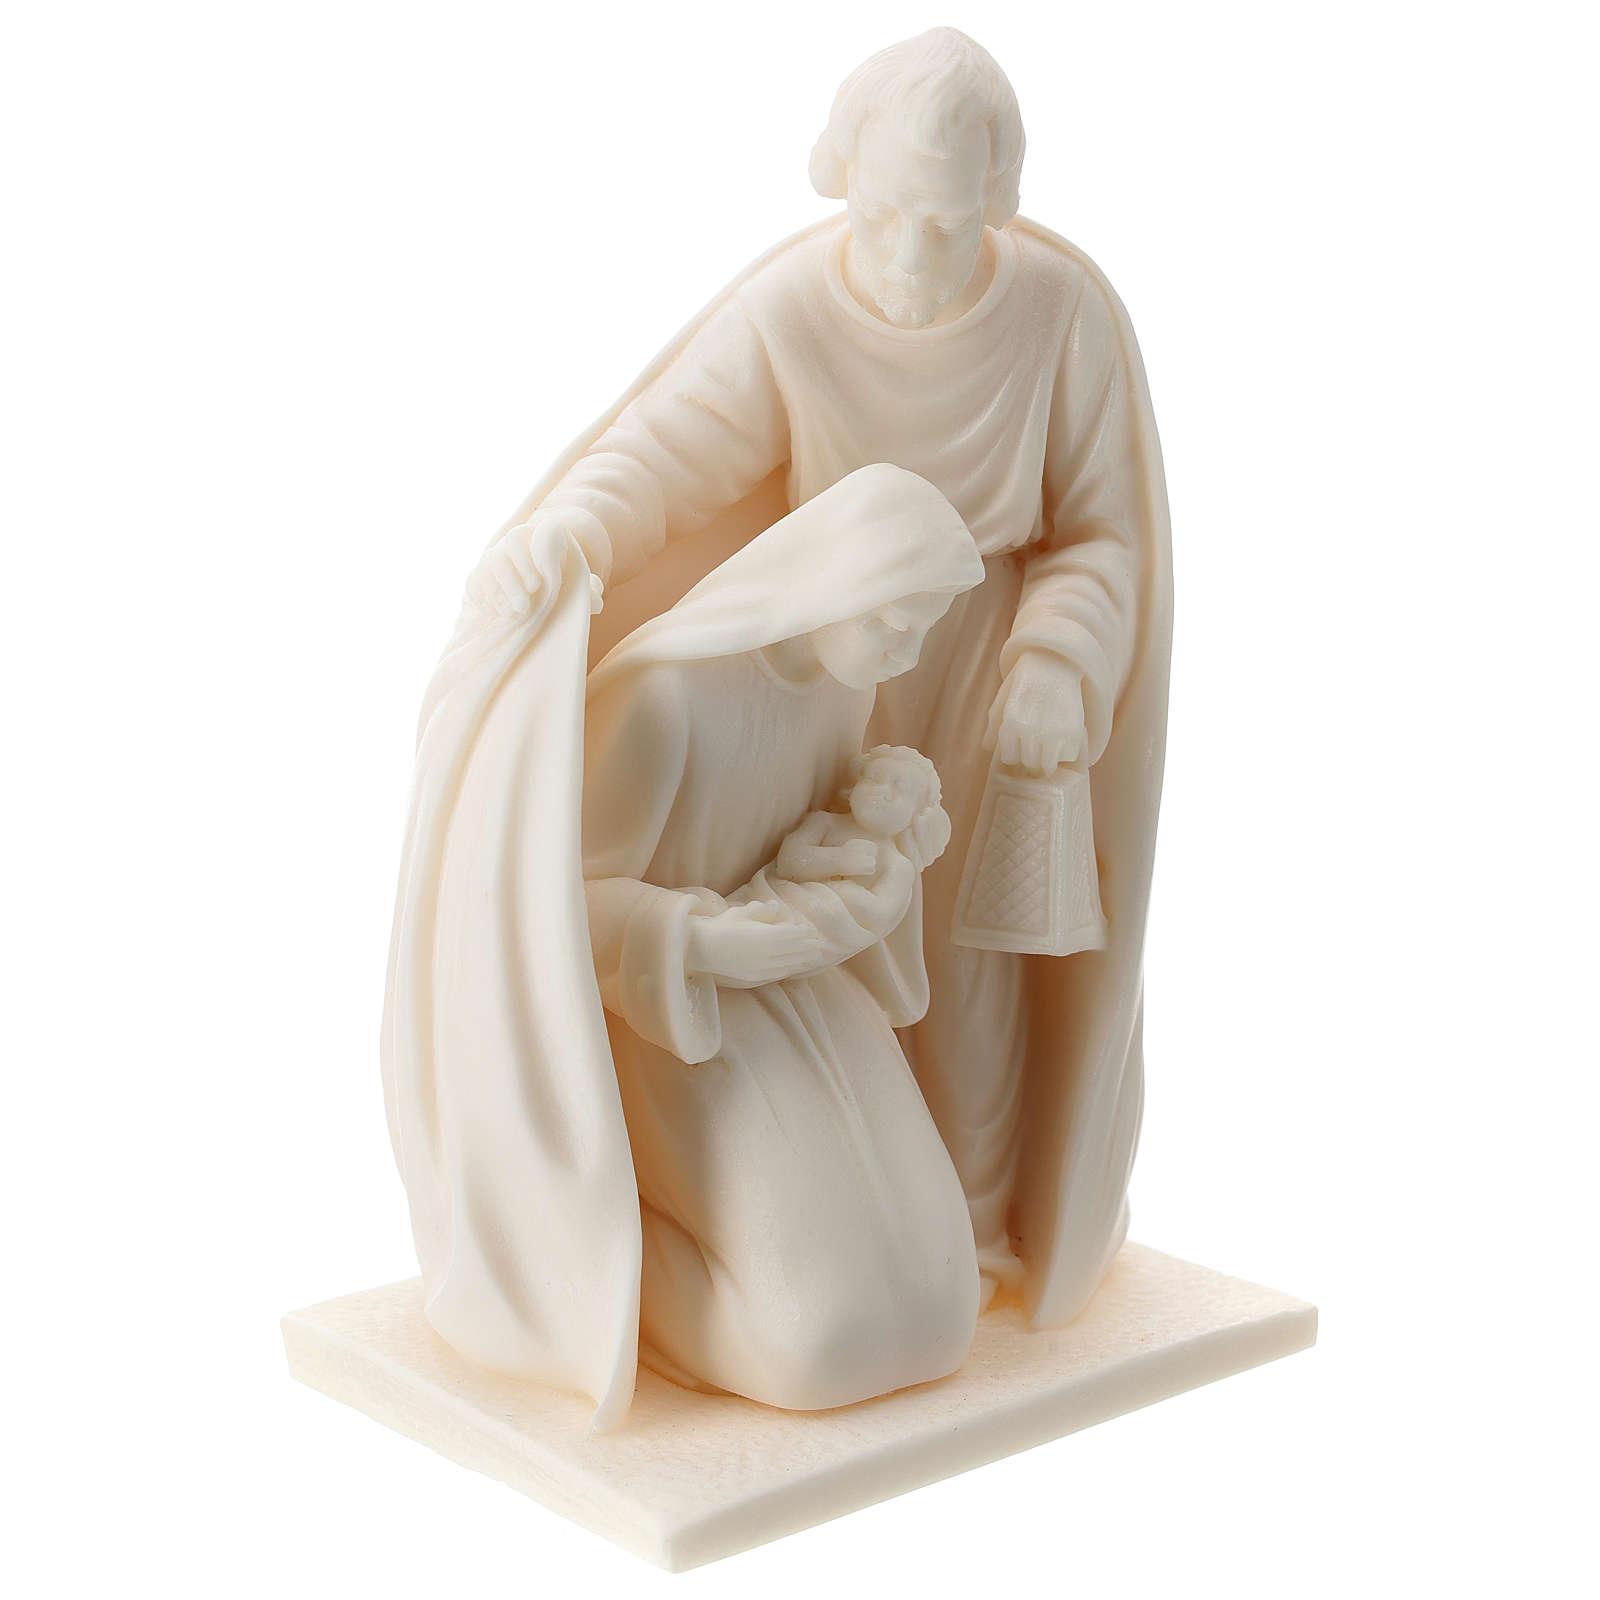 Natividad resina blanca 15 cm 3